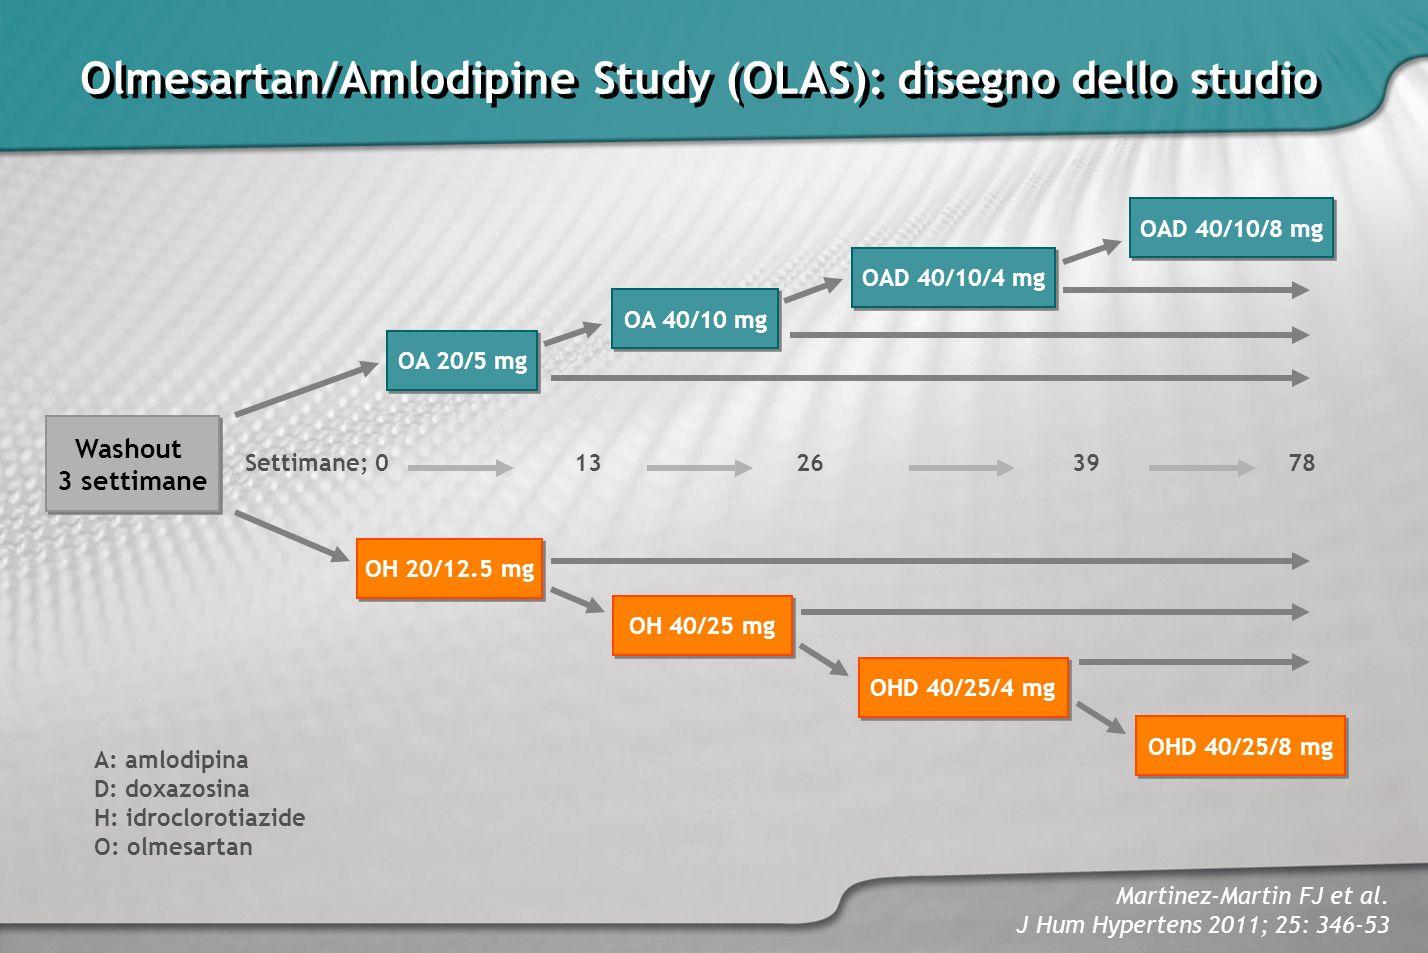 Martinez-Martin FJ et al. J Hum Hypertens 2011; 25: 346-53 Olmesartan/Amlodipine Study (OLAS): disegno dello studio A: amlodipina D: doxazosina H: idr